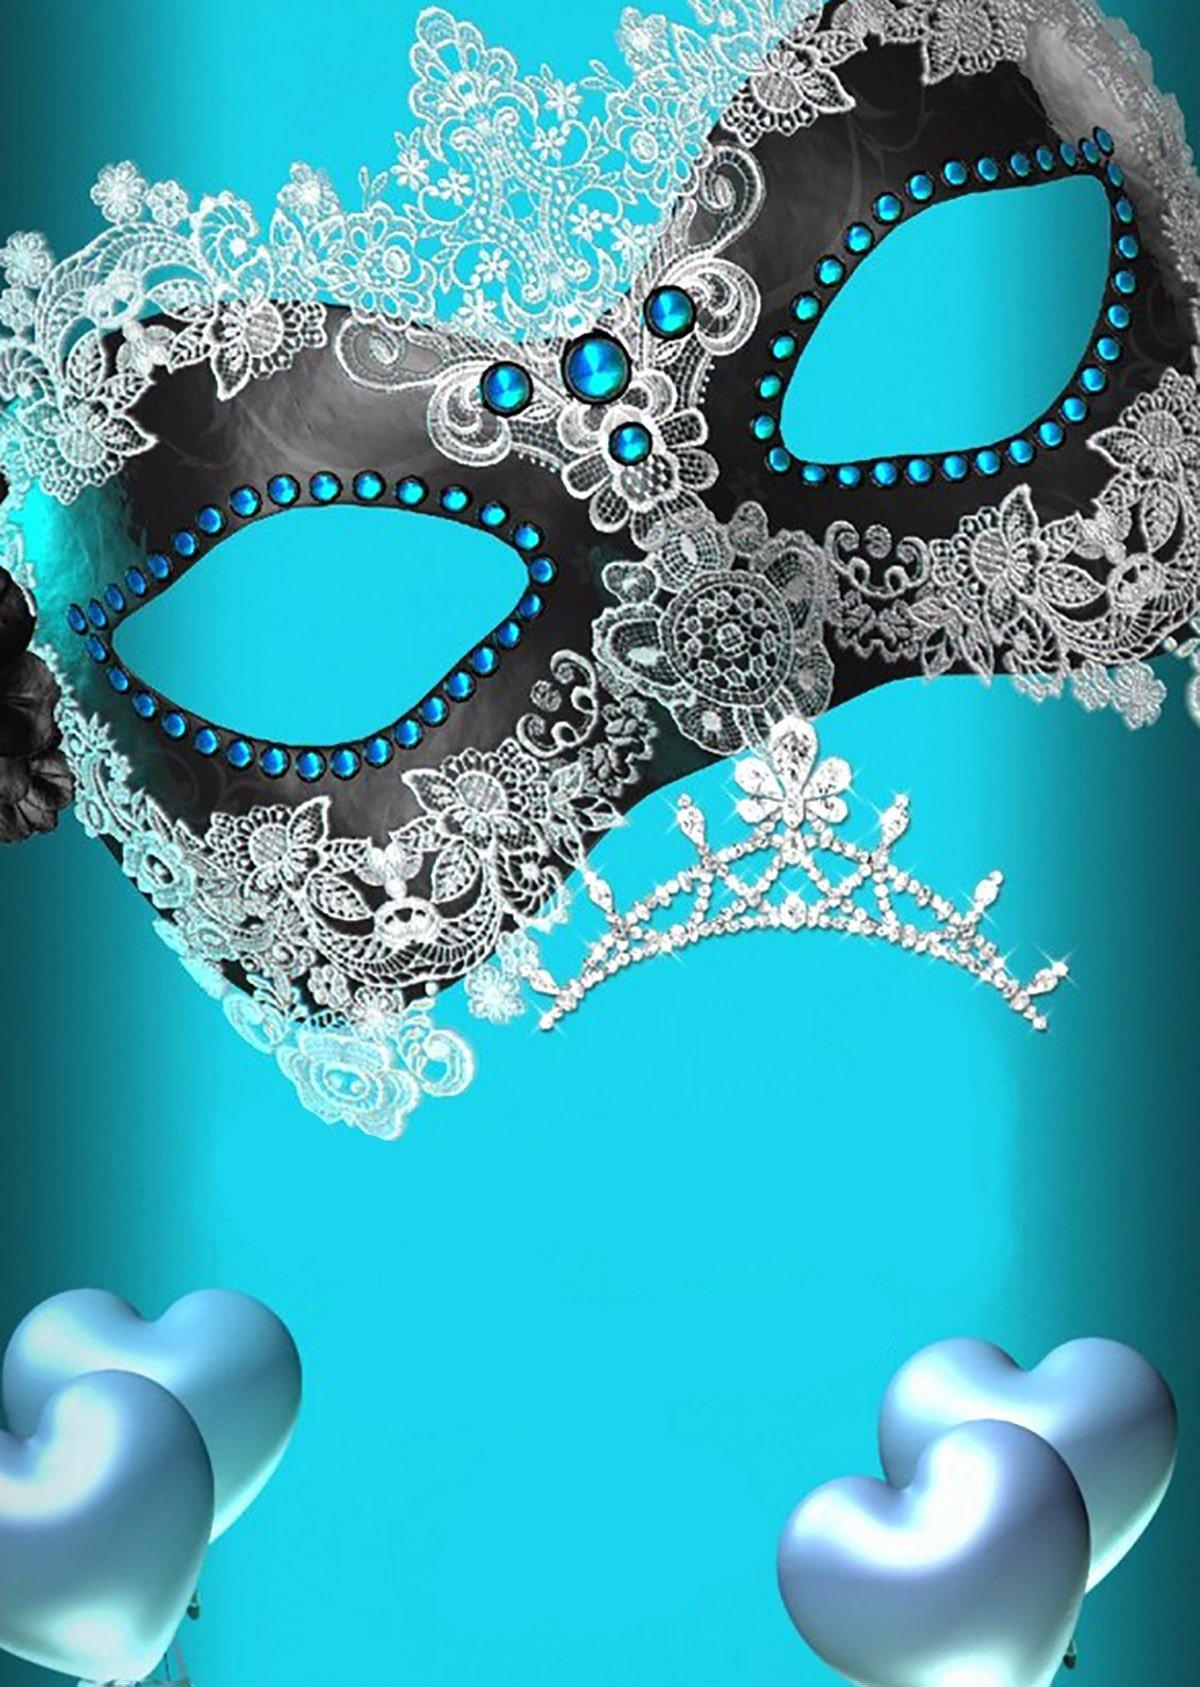 Masquerade Party Invitations Templates Free Fresh Free Printable Masquerade Invitation Templates